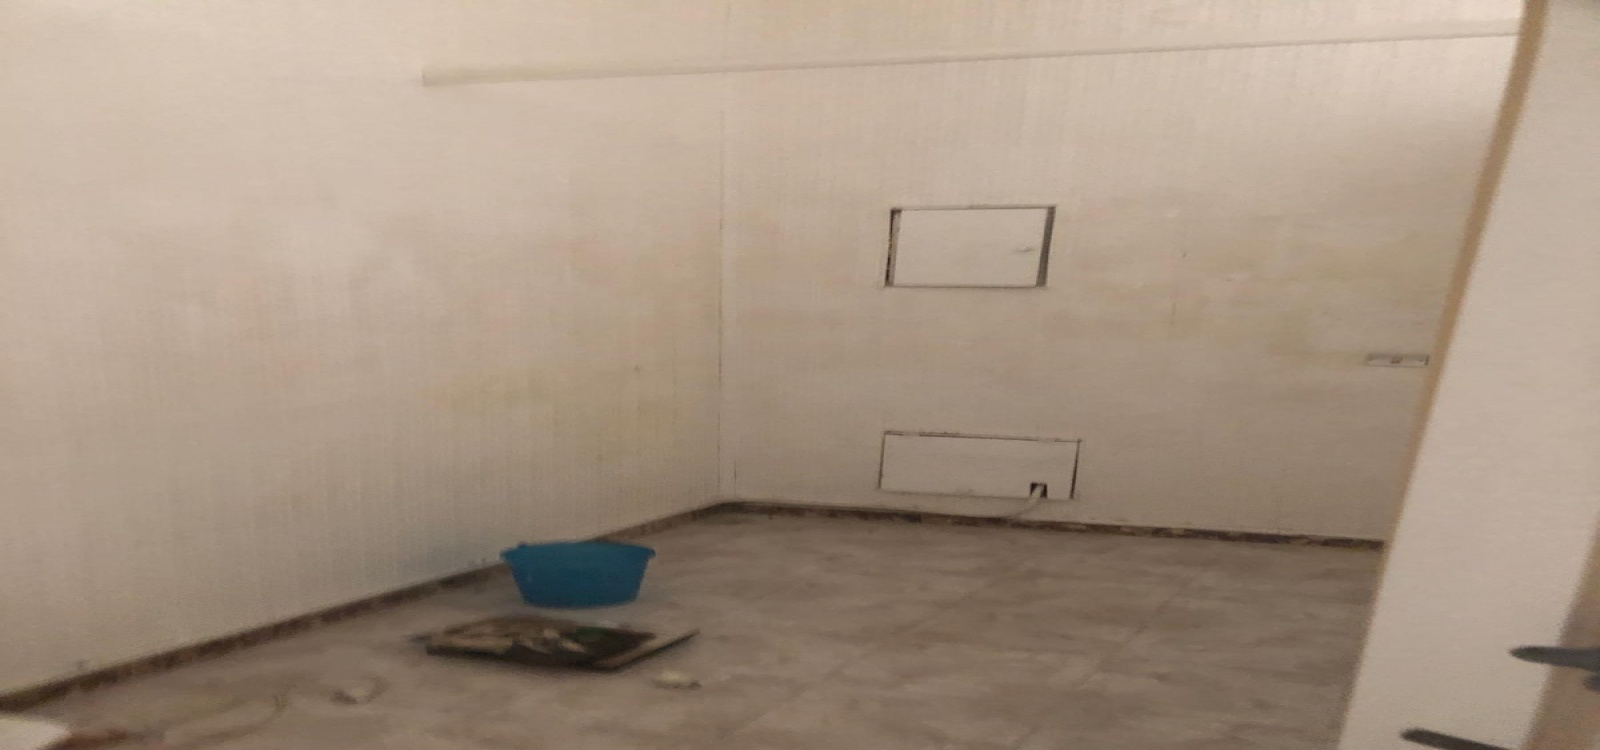 Borgata,siracusa,SIRACUSA,96100,Appartamento,Borgata,siracusa,2314